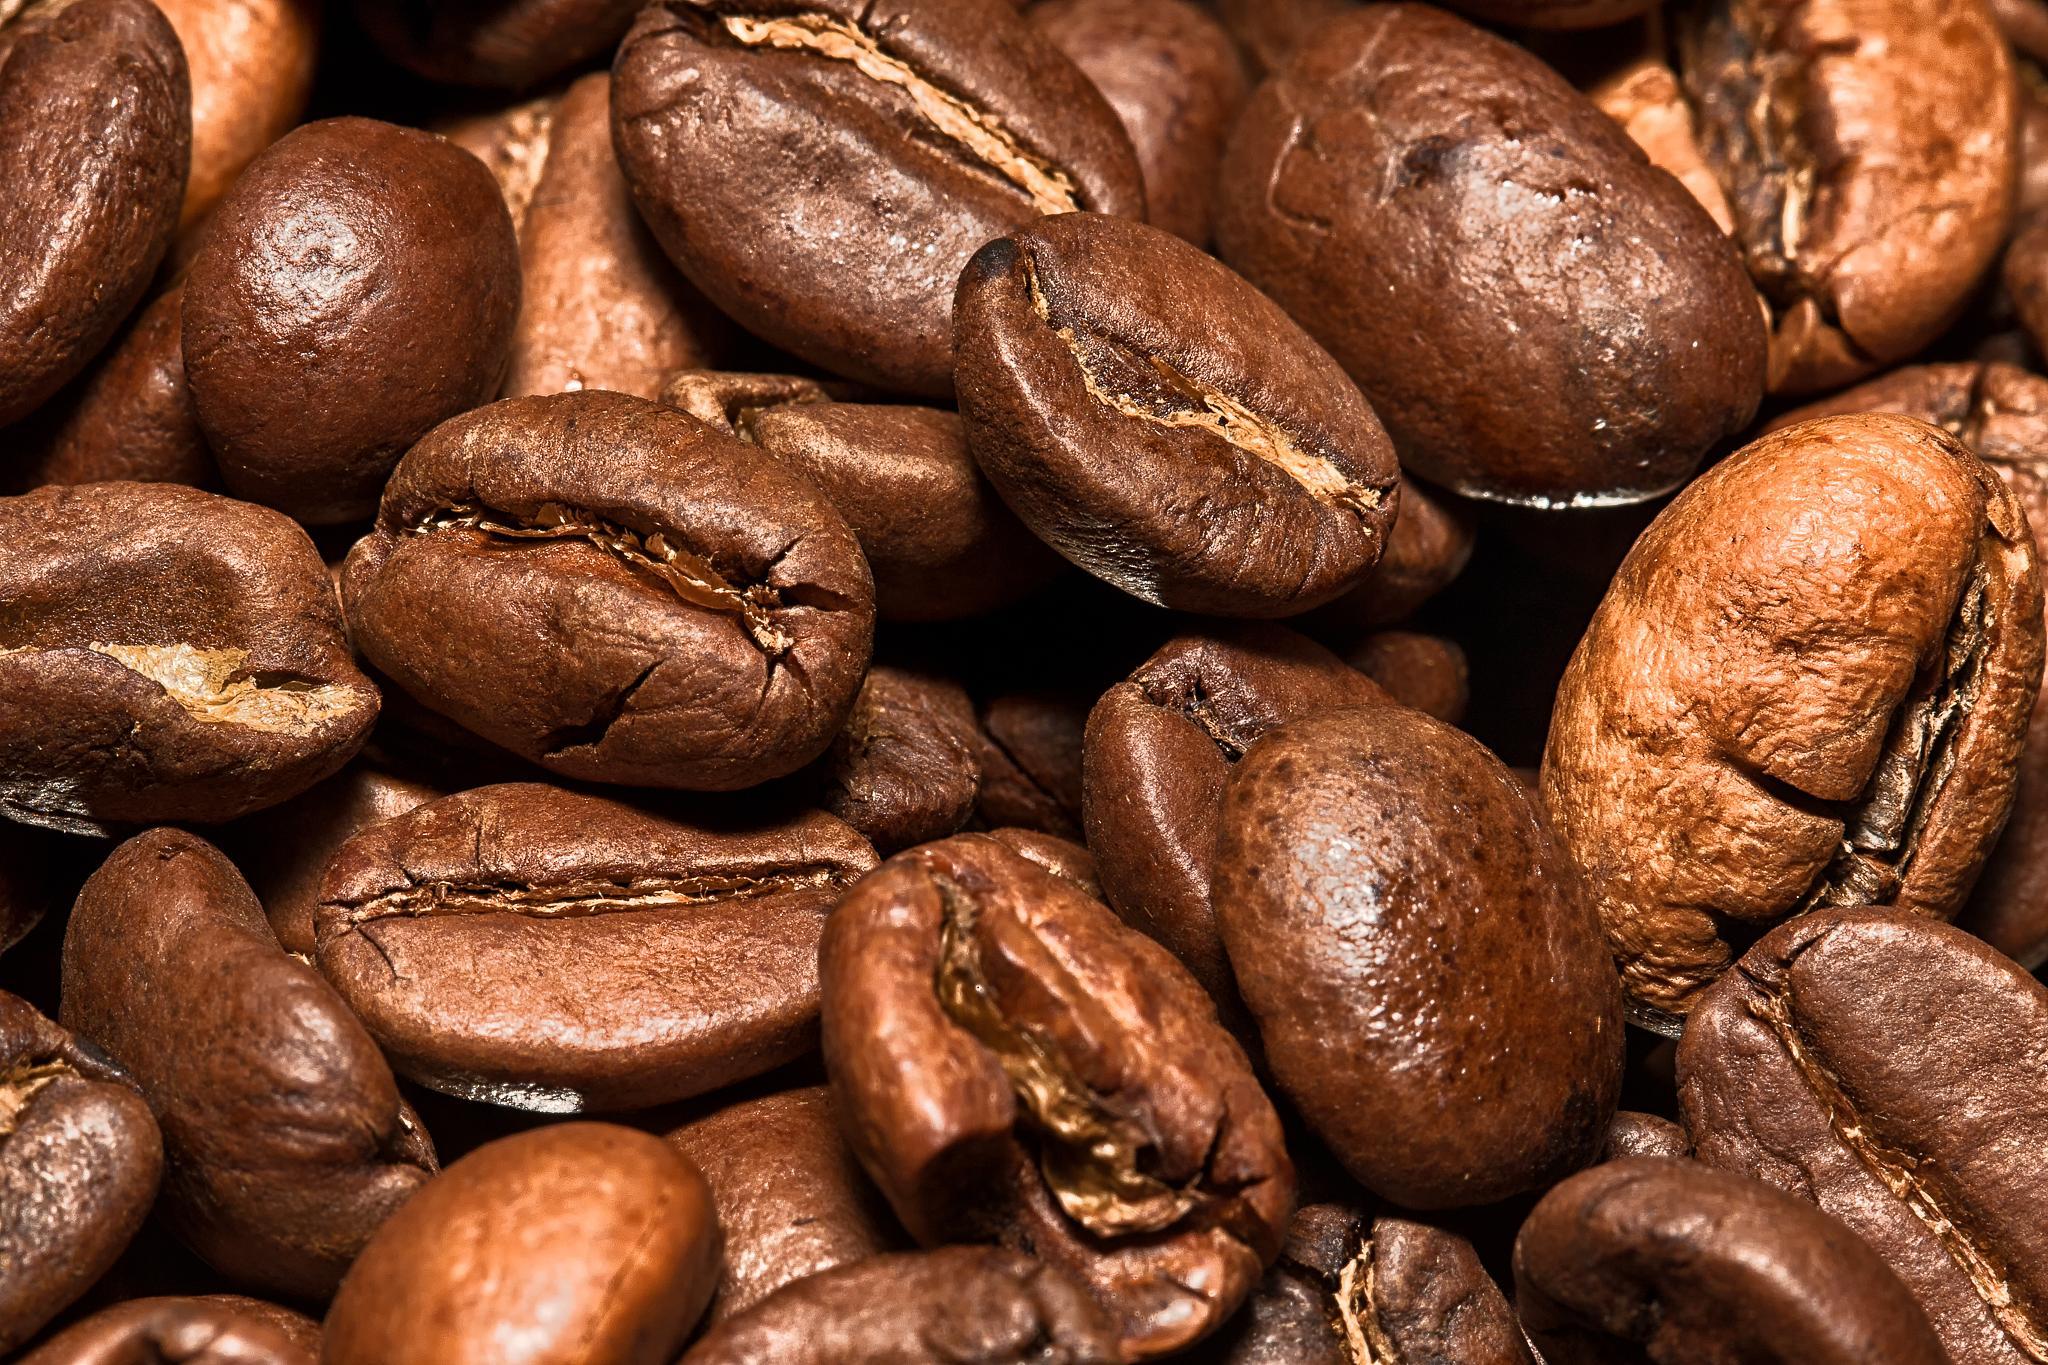 Coffee Beans by Matthias Walker